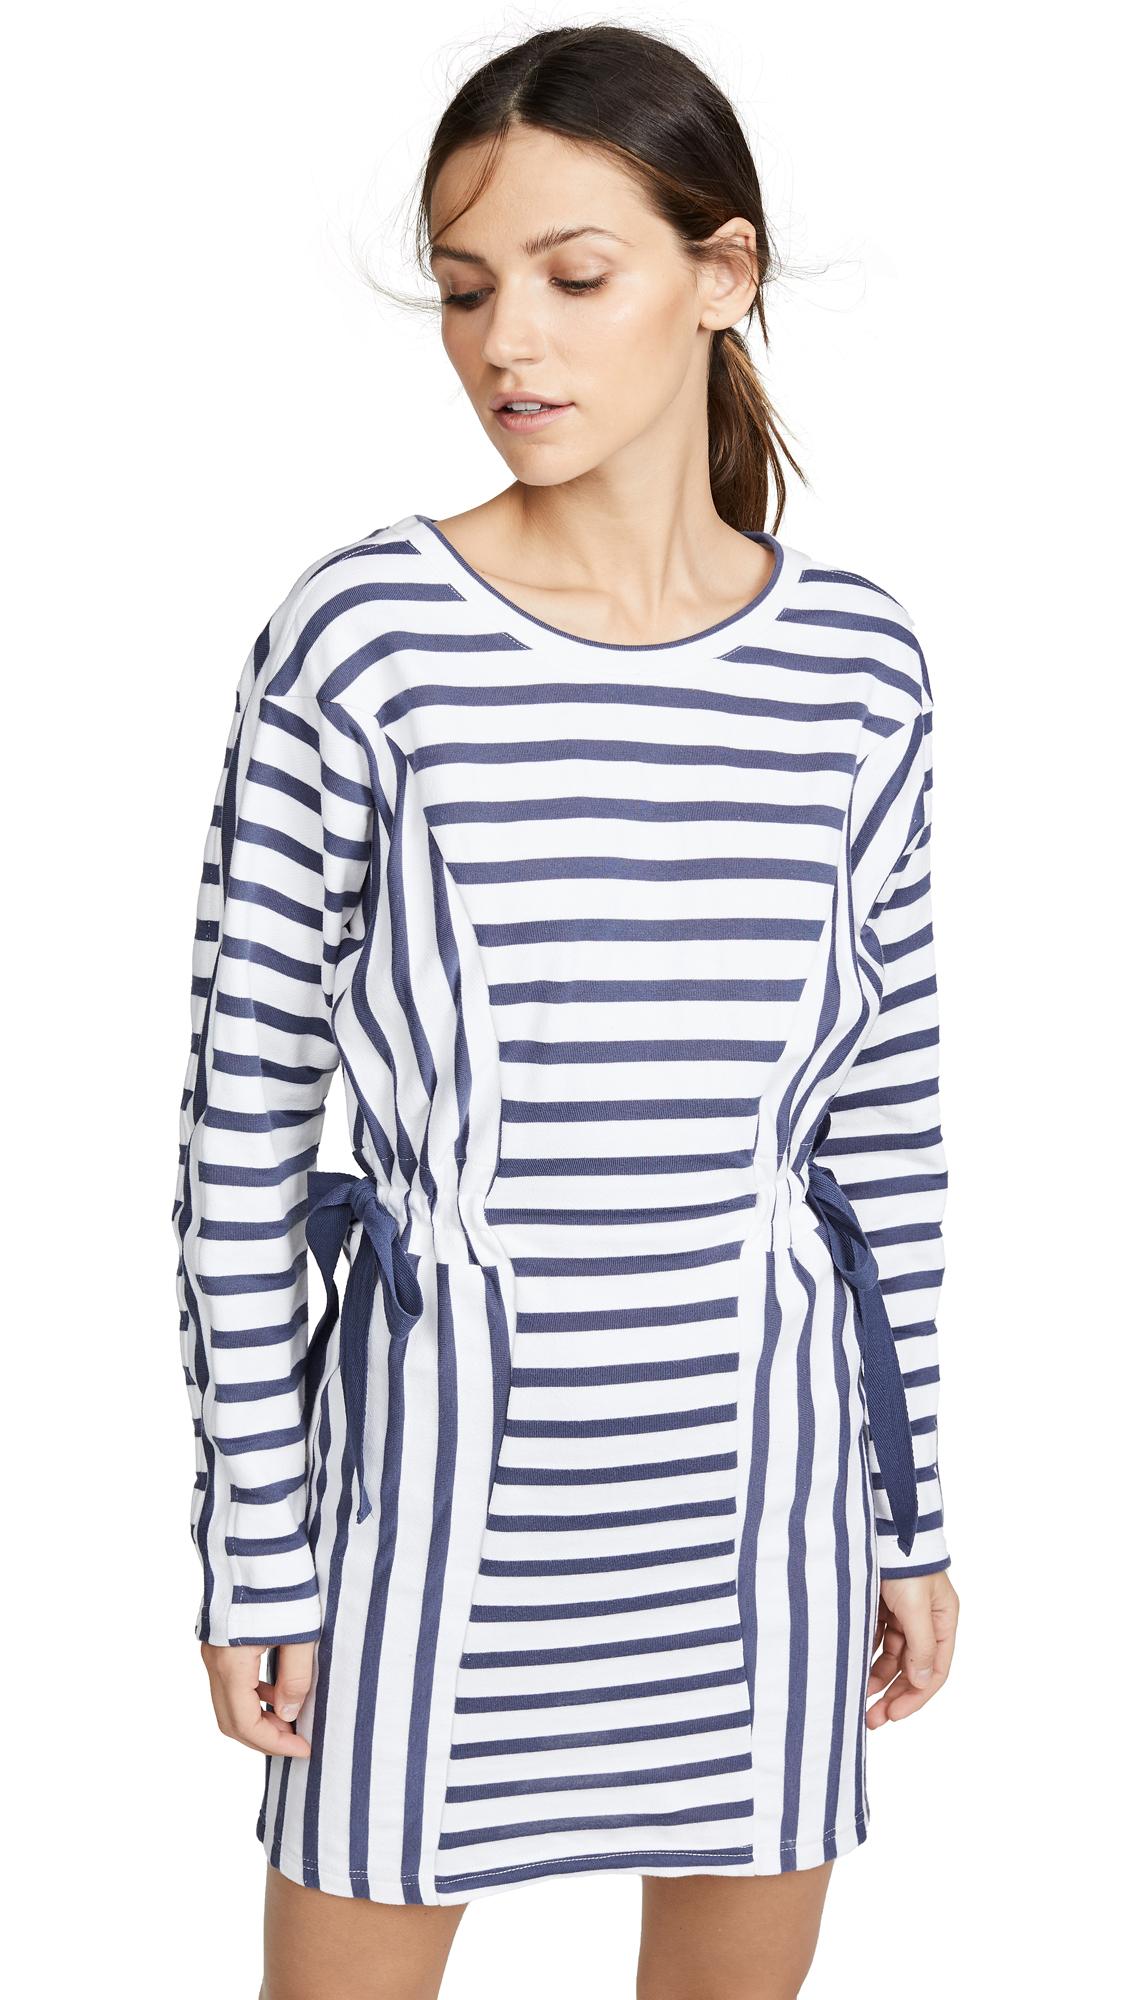 Parker Weekend Shauna Dress - Navy Stripe